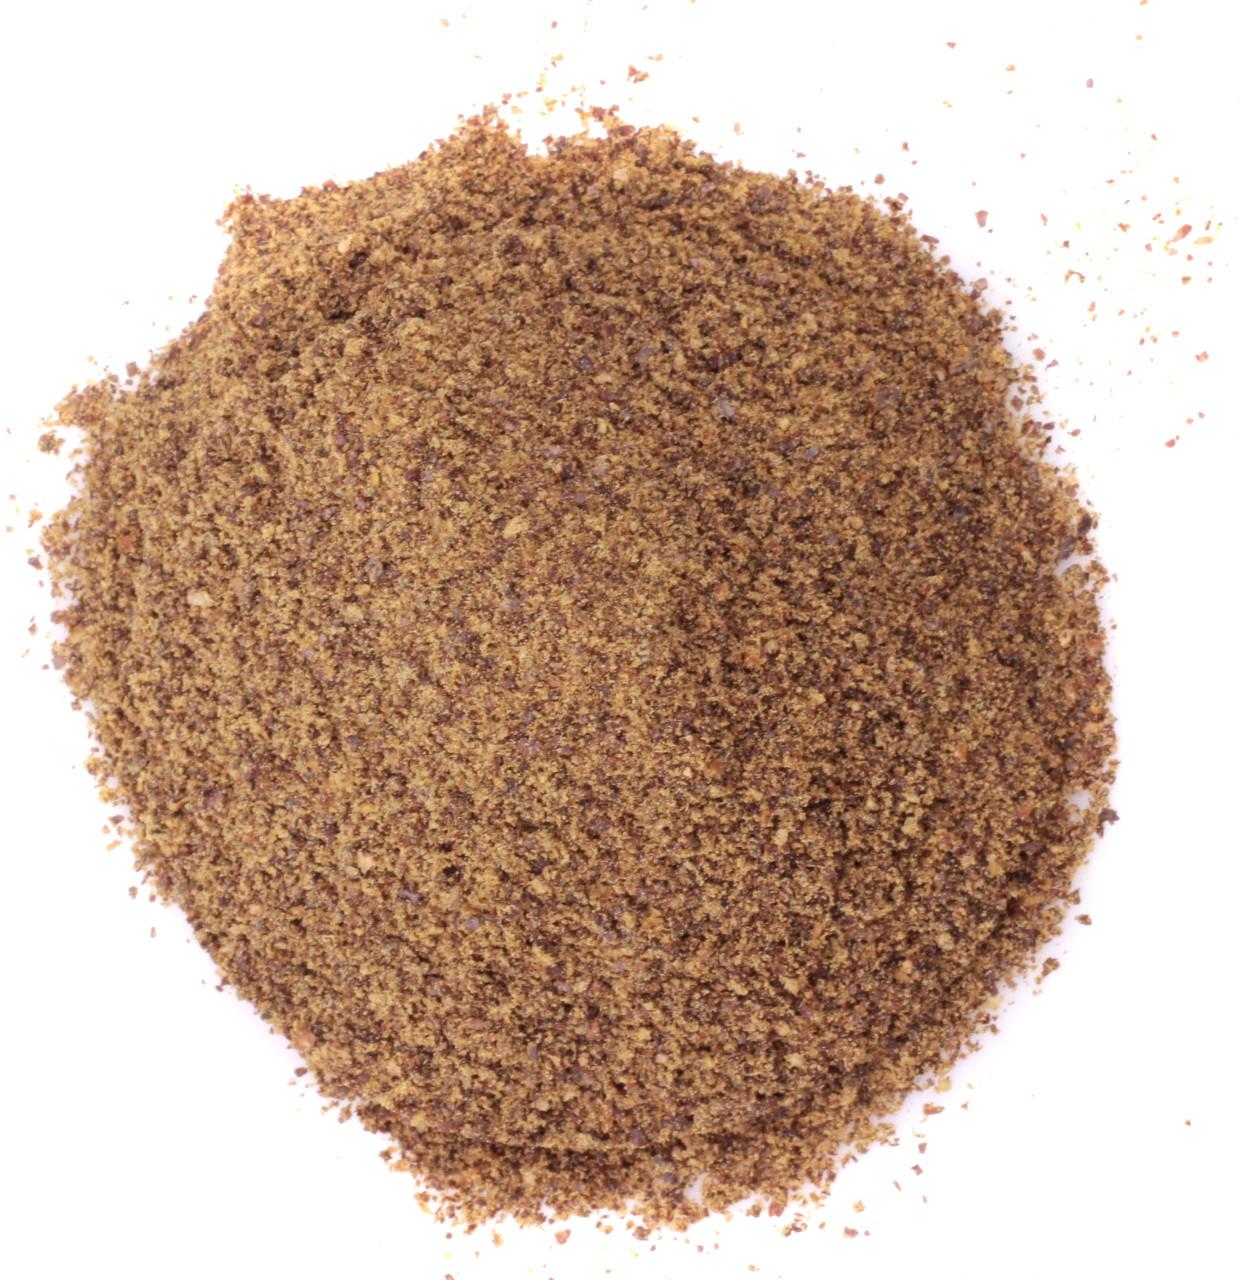 Planteon Mąka konopna 10kg 2-0395-02-7